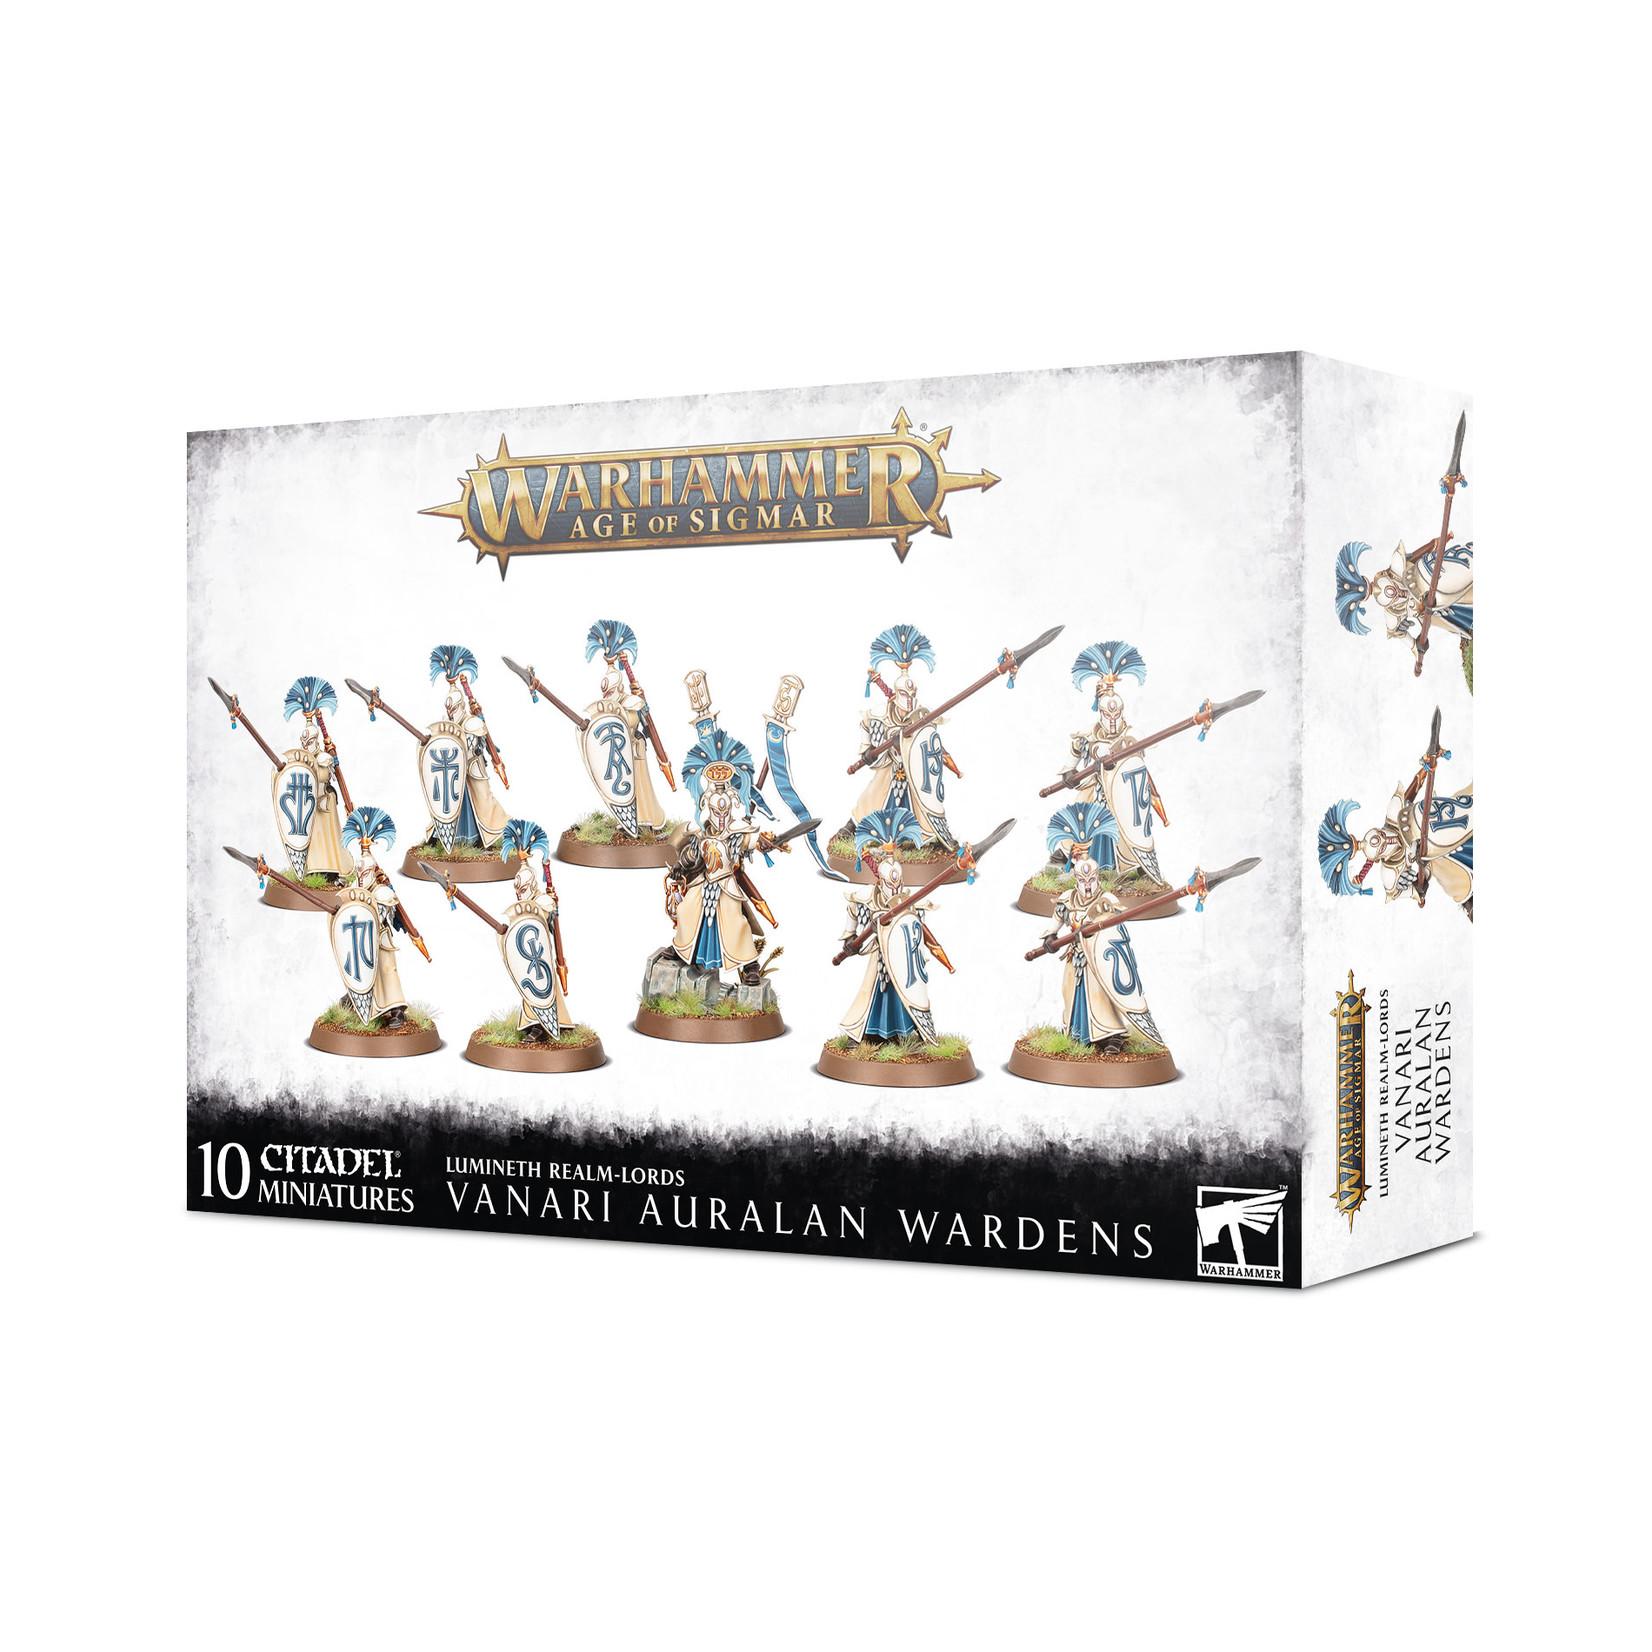 Games Workshop Warhammer Age of Sigmar: Lumineth Realm-Lords Vanari Auralan Wardens